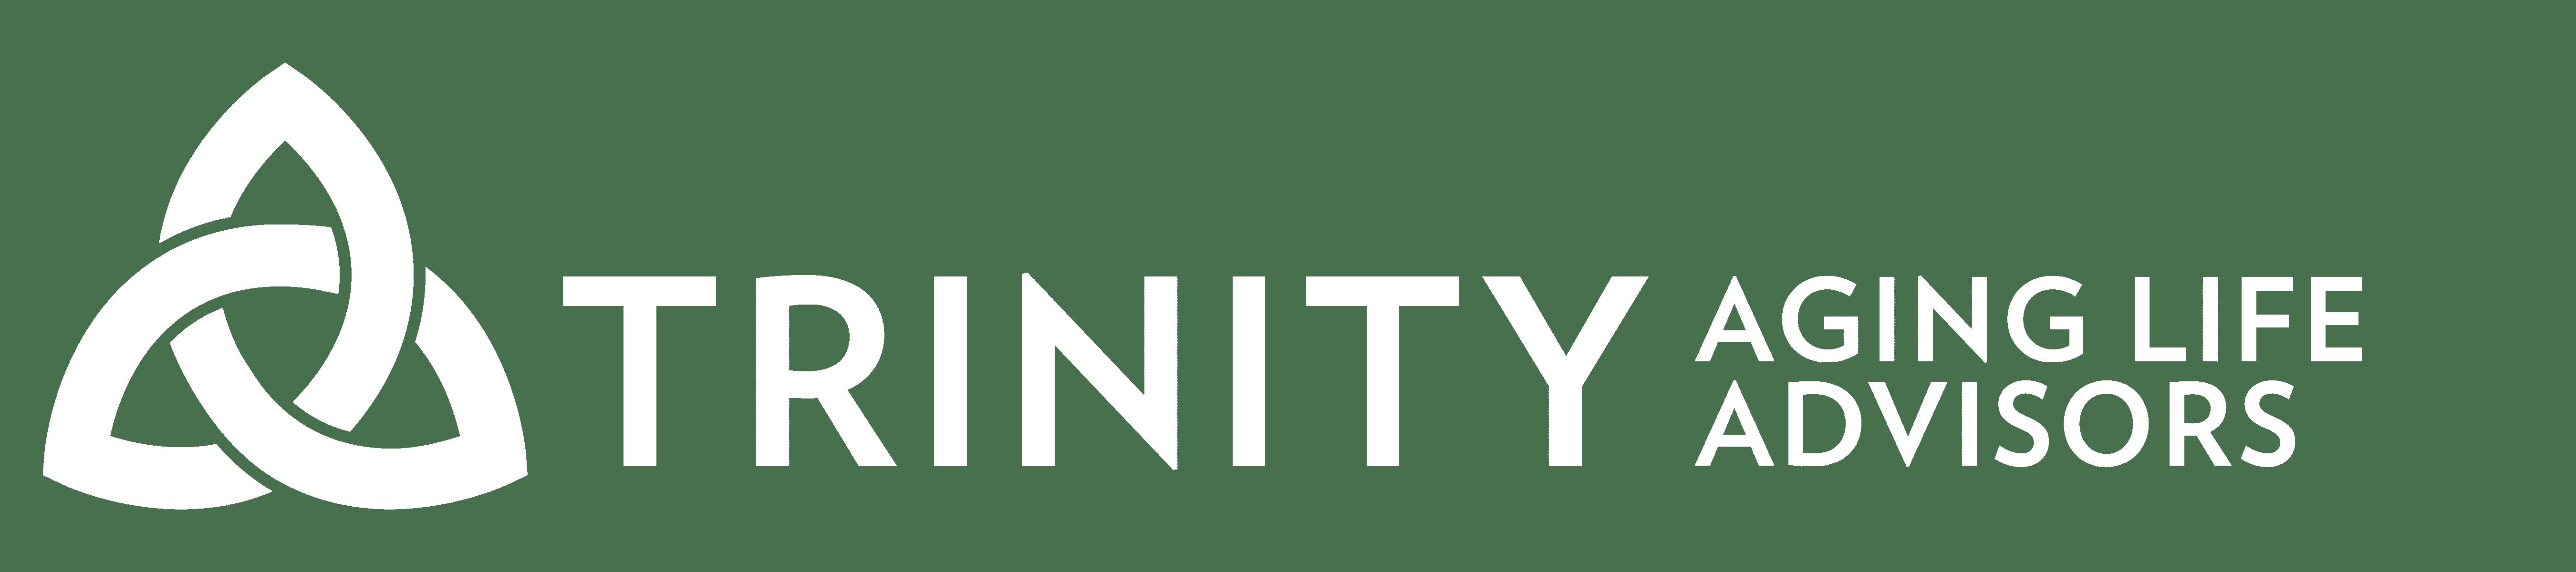 Trinity Aging Life Advisors